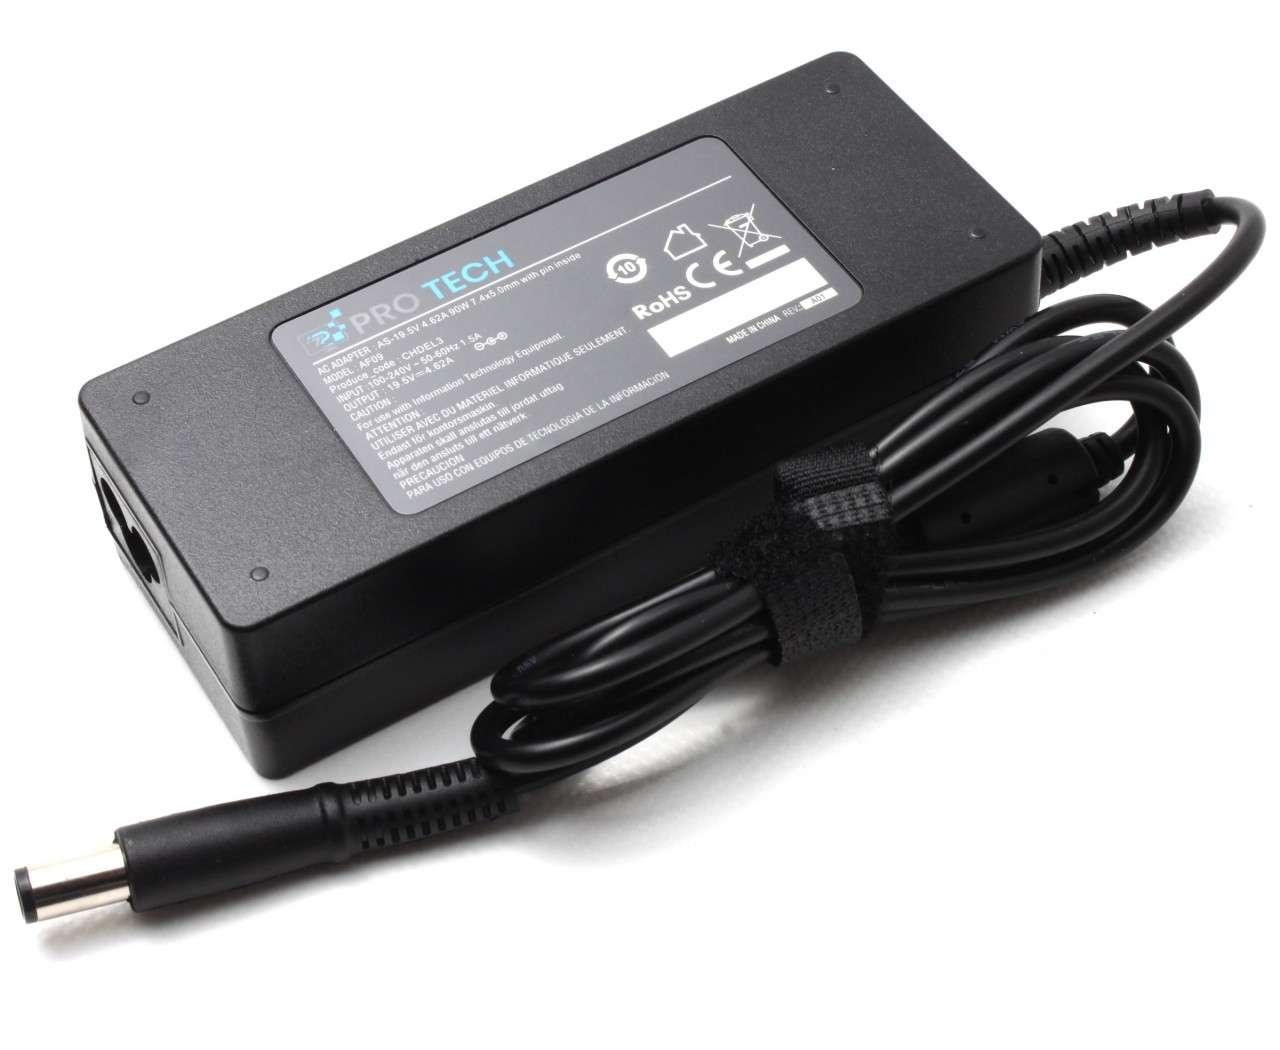 Incarcator Dell Inspiron 1440 Replacement imagine powerlaptop.ro 2021